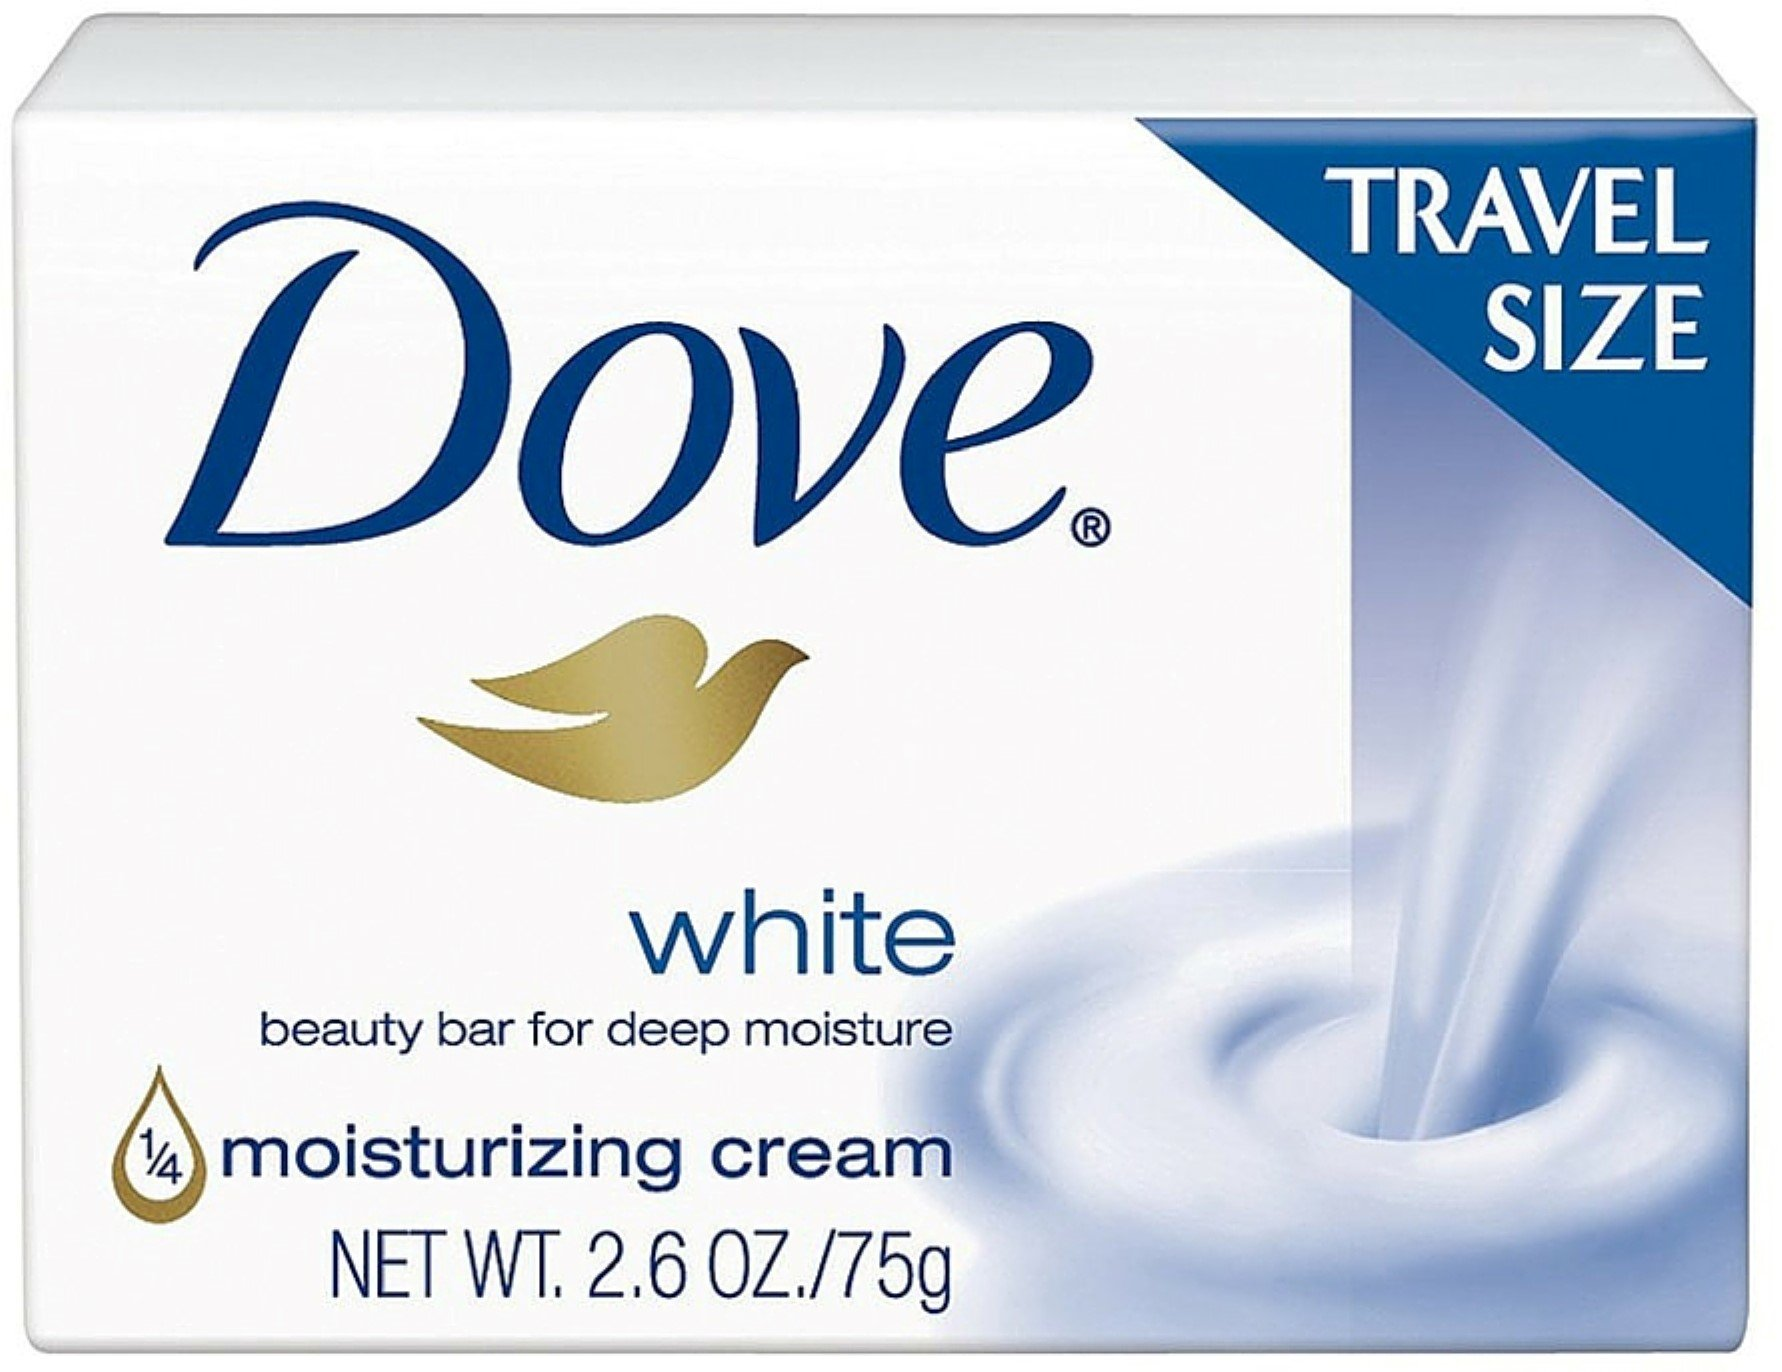 Dove White Travel Size Bar Soap With Moisturizing Cream 2.6 oz (Pack of 12)